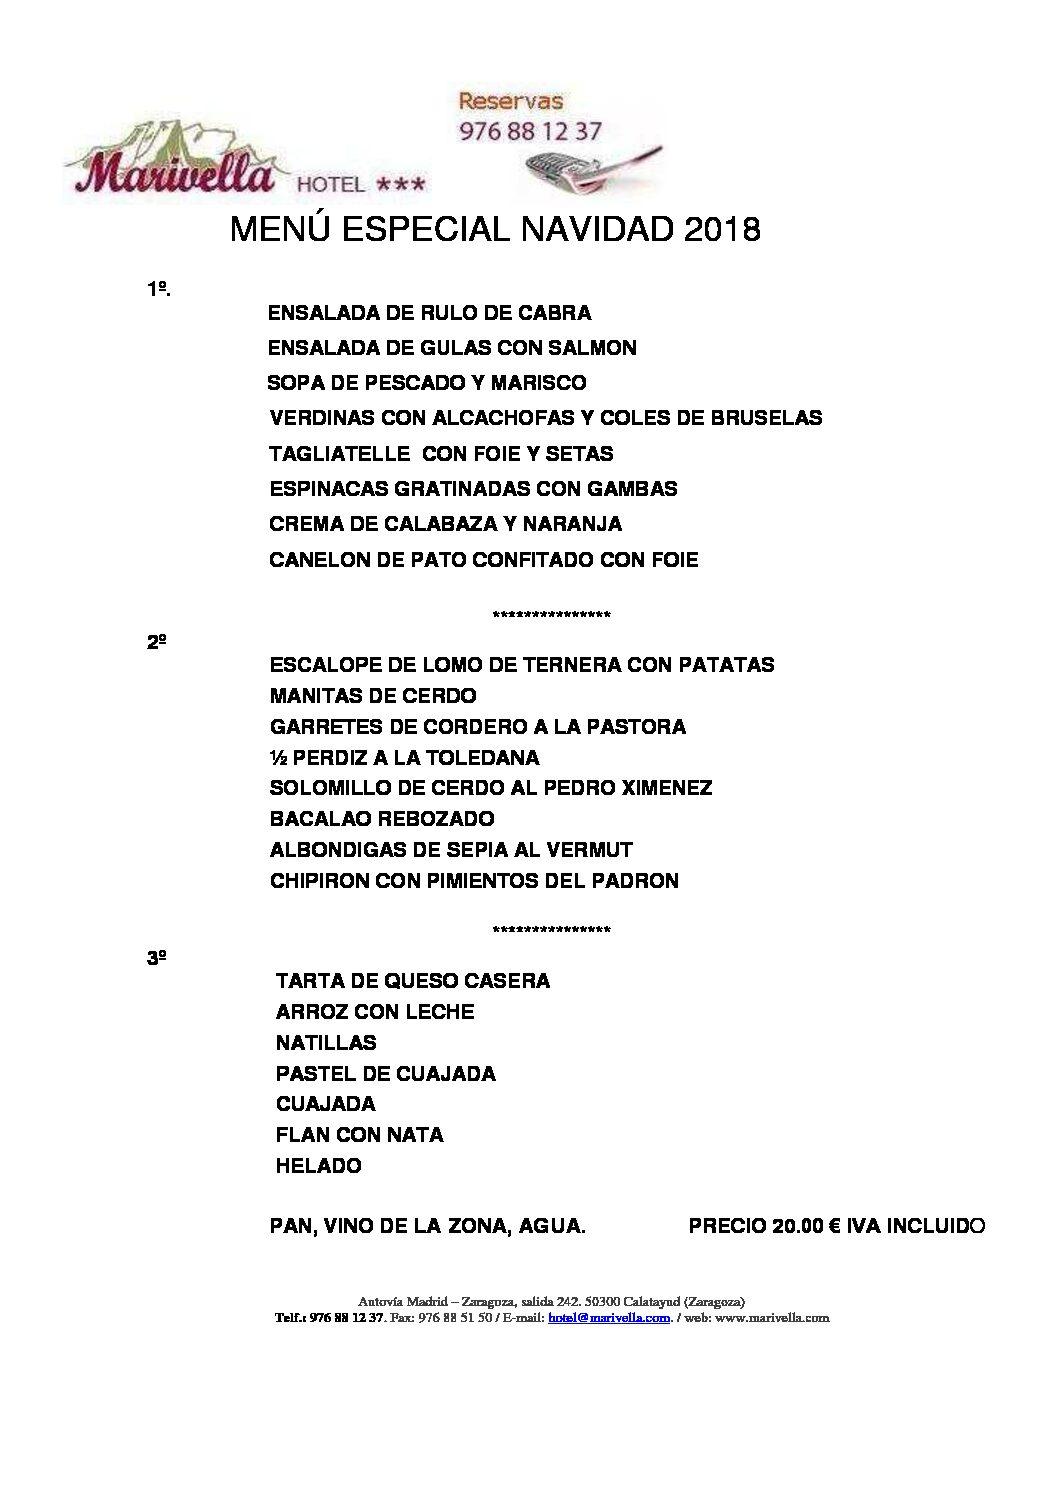 MENU-ESPECIAL-NAVIDAD-2018-pdf.jpg